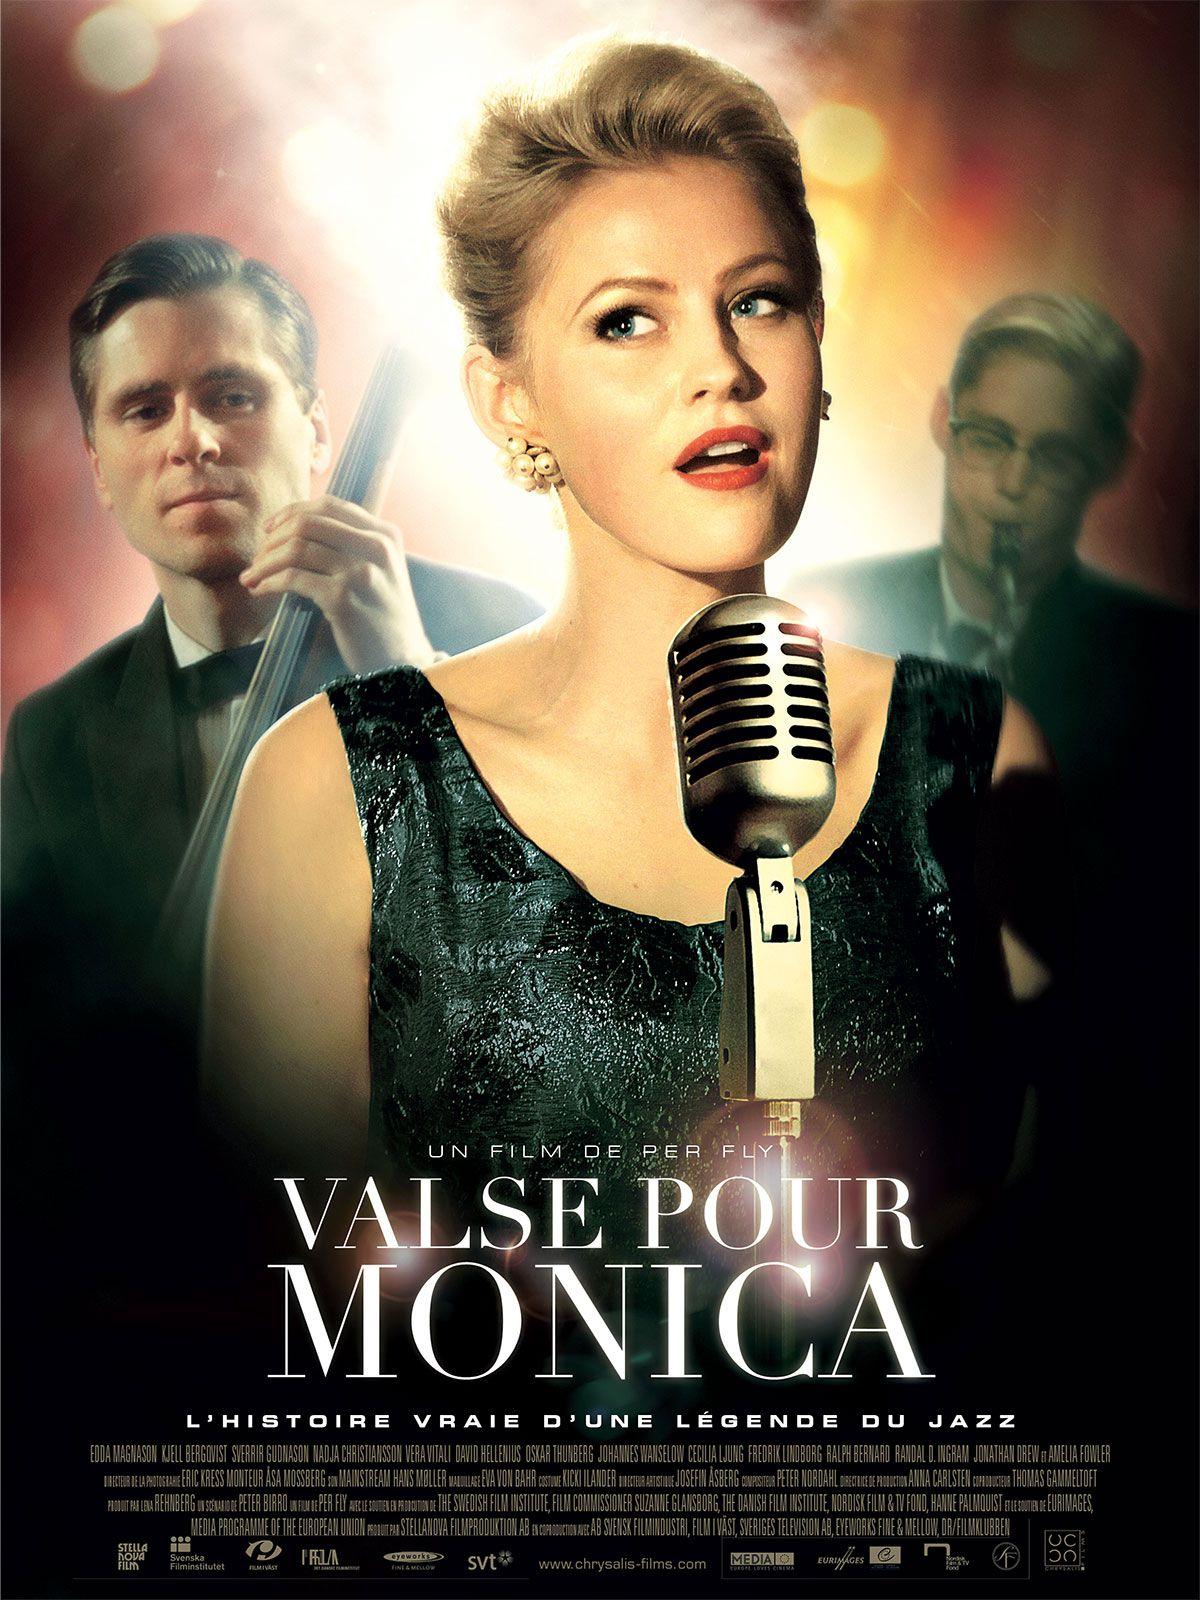 Valse pour Monica - Film (2013)